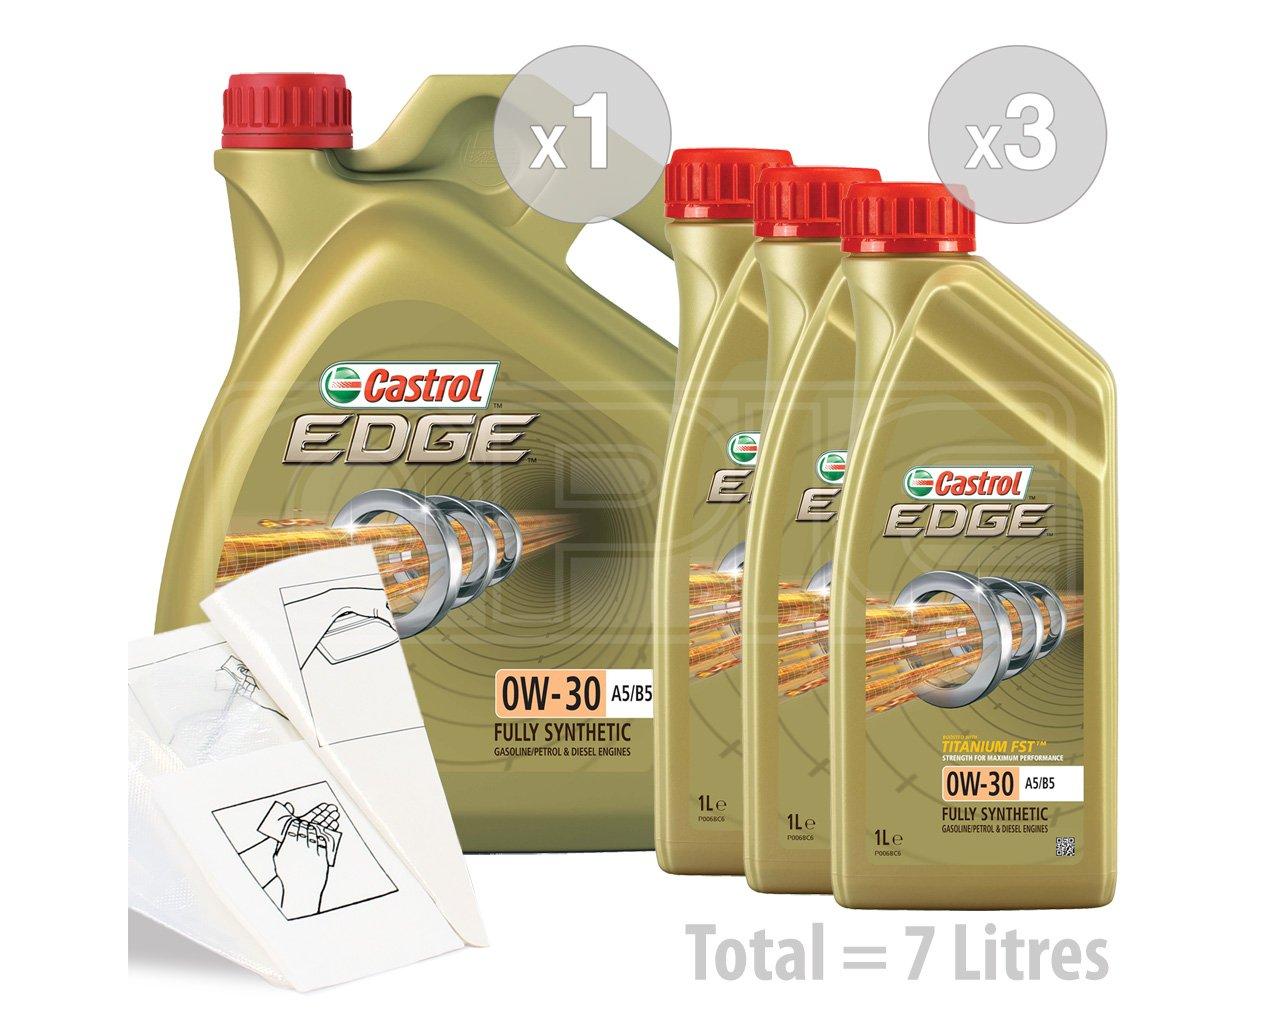 Castrol EDGE Aceite de motor de coche A5/B5 totalmente sintético de titanio 0 W-30 FST - Service Pack: 7 litros: Amazon.es: Coche y moto